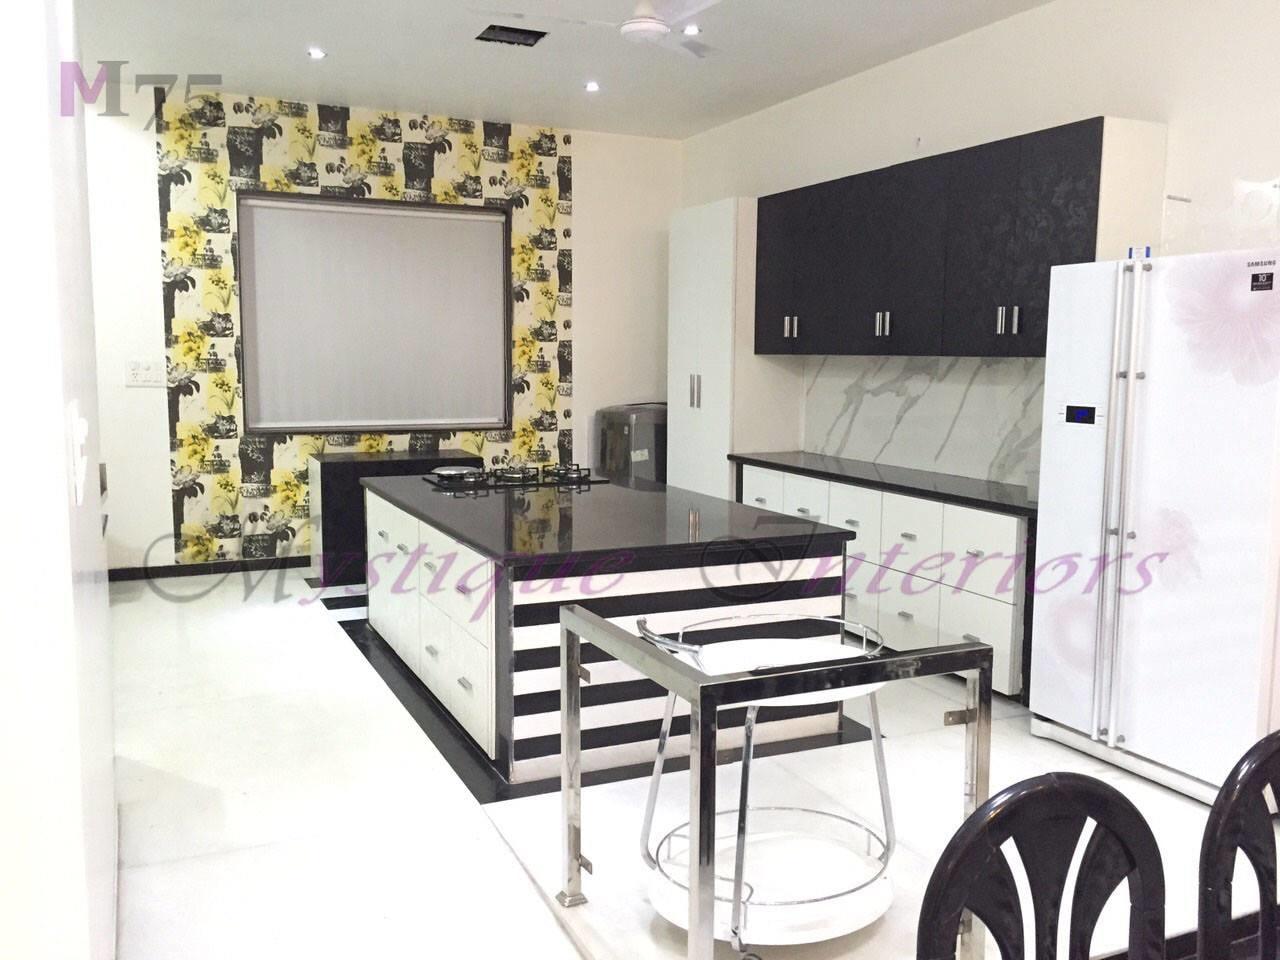 floral White Modular Kitchen With Wall Art And Cabinets by Khyaati Verma Modular-kitchen Modern | Interior Design Photos & Ideas